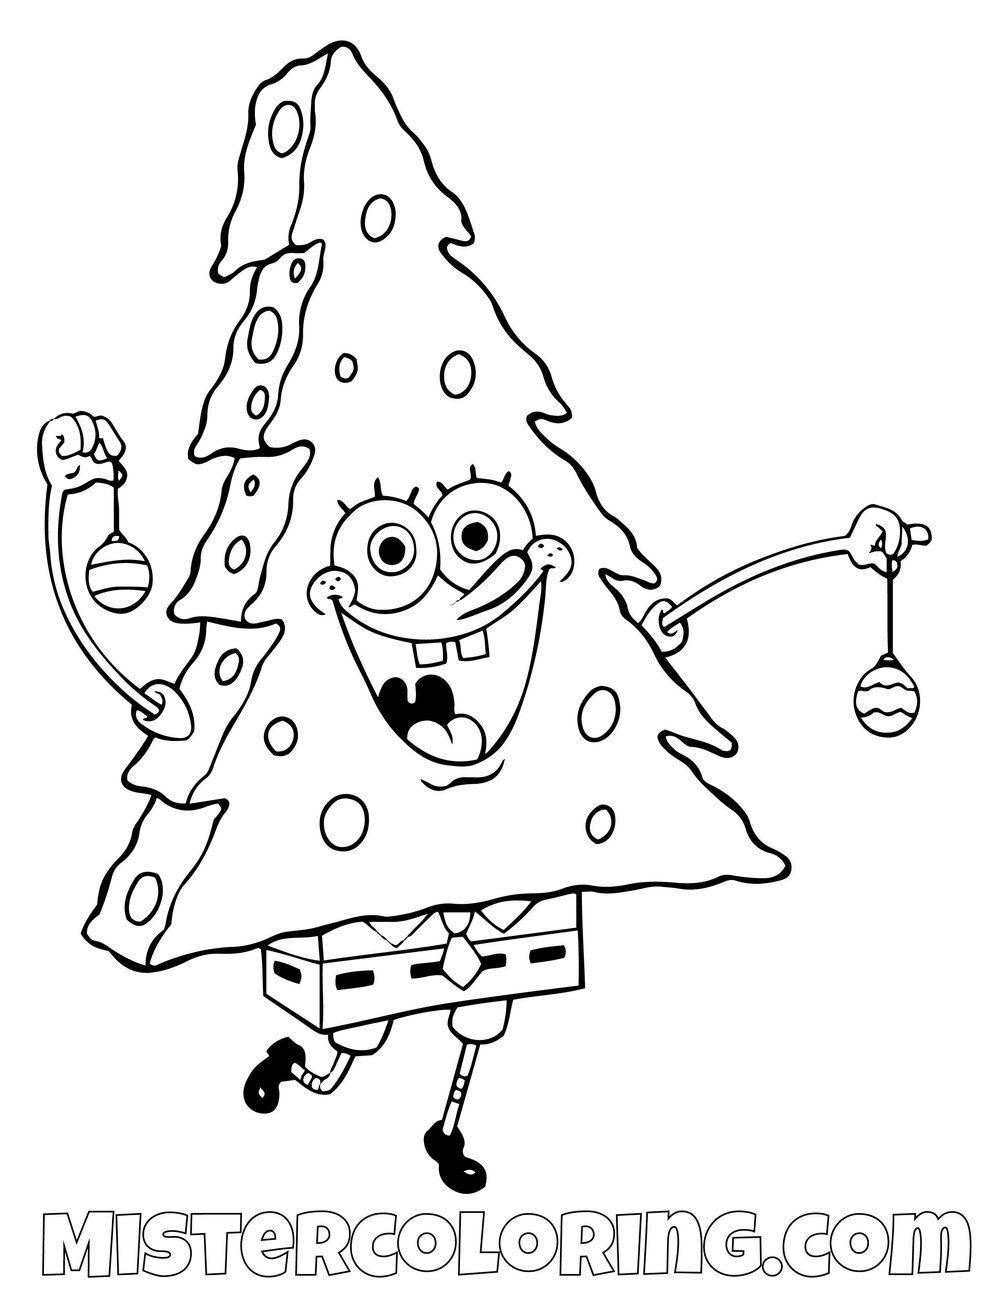 Spongebob Christmas Tree Costume Spongebob Squarepants Coloring Pages For Kids Halloween Coloring Pages Printable Christmas Coloring Pages Spongebob Christmas